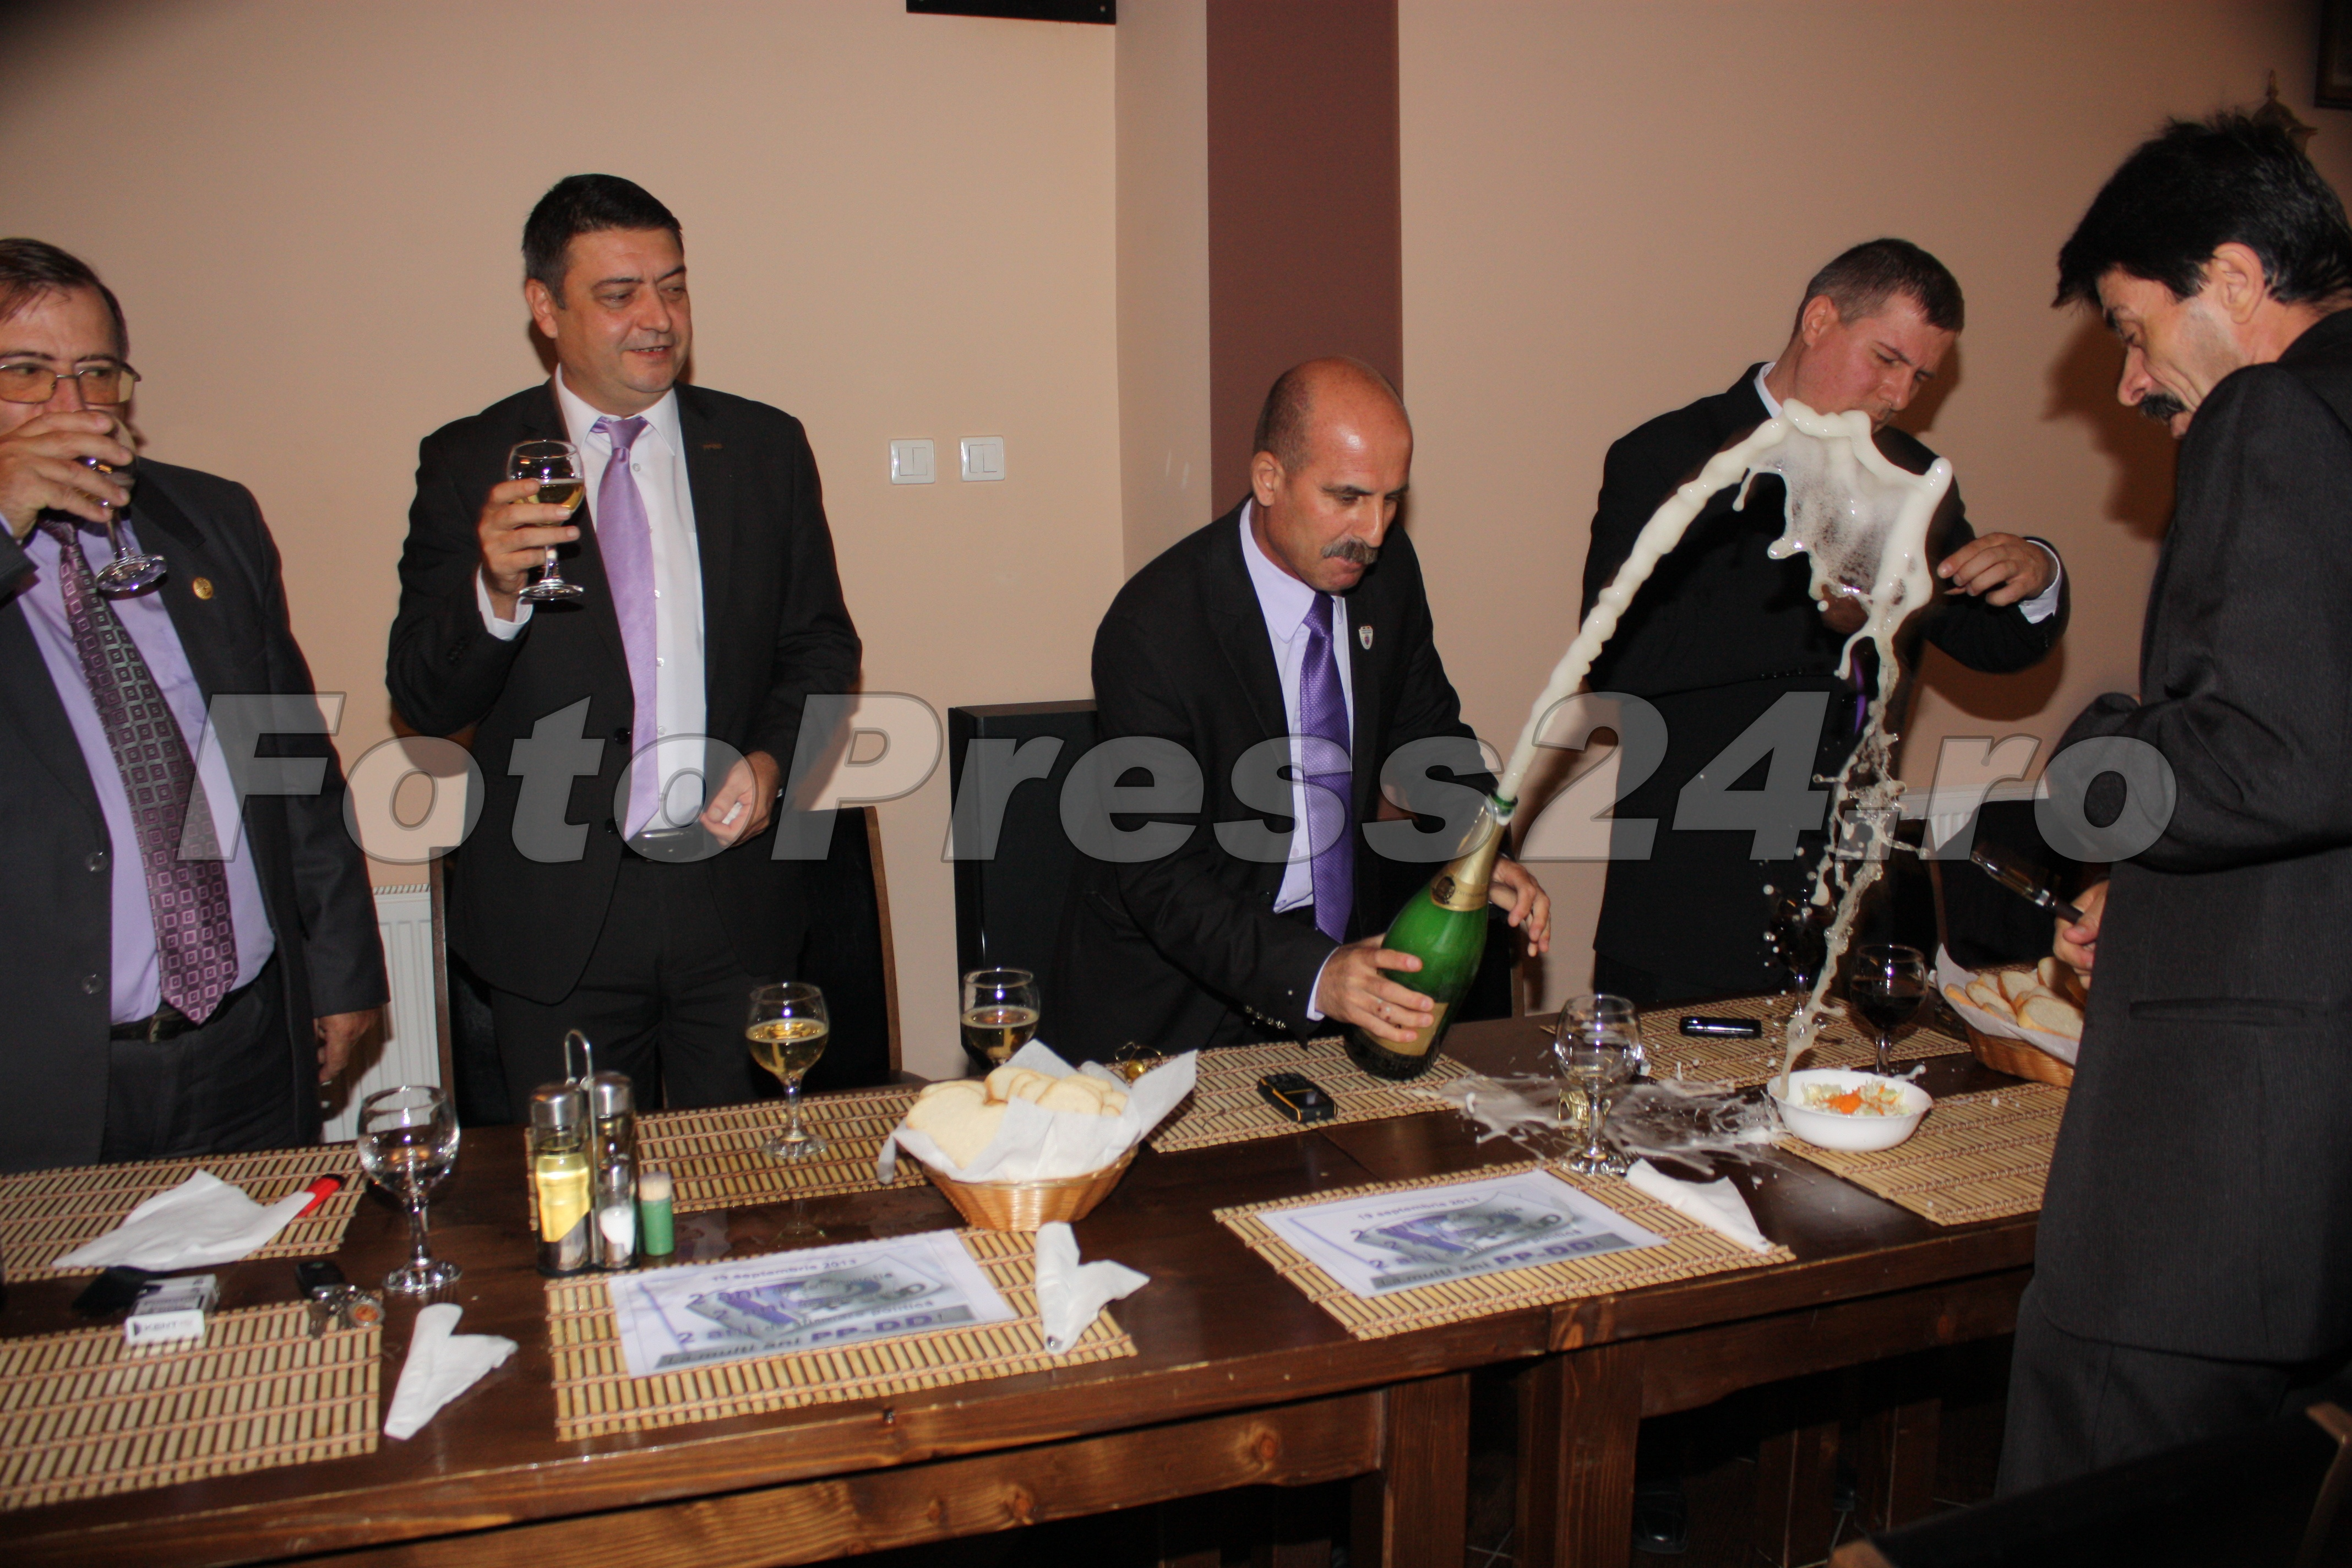 aniversare 2ani ppdd-pitesti foto Mihai Neacsu-FotoPress24.ro (12)